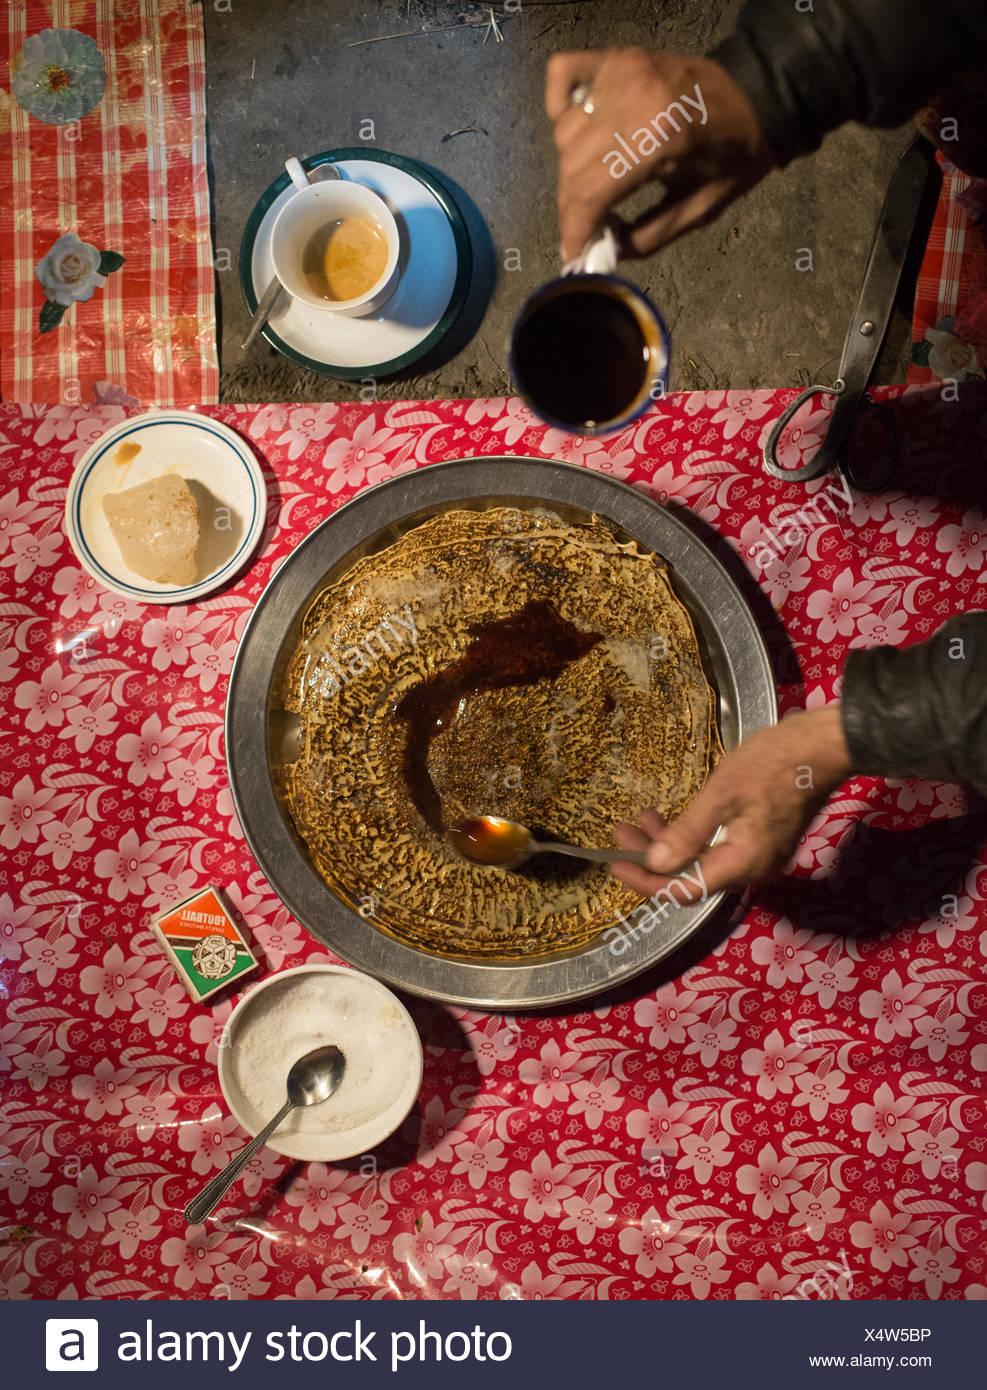 A woman cooks a meal of Maltashtze Giyaling, Hunza pancakes. - Stock Image